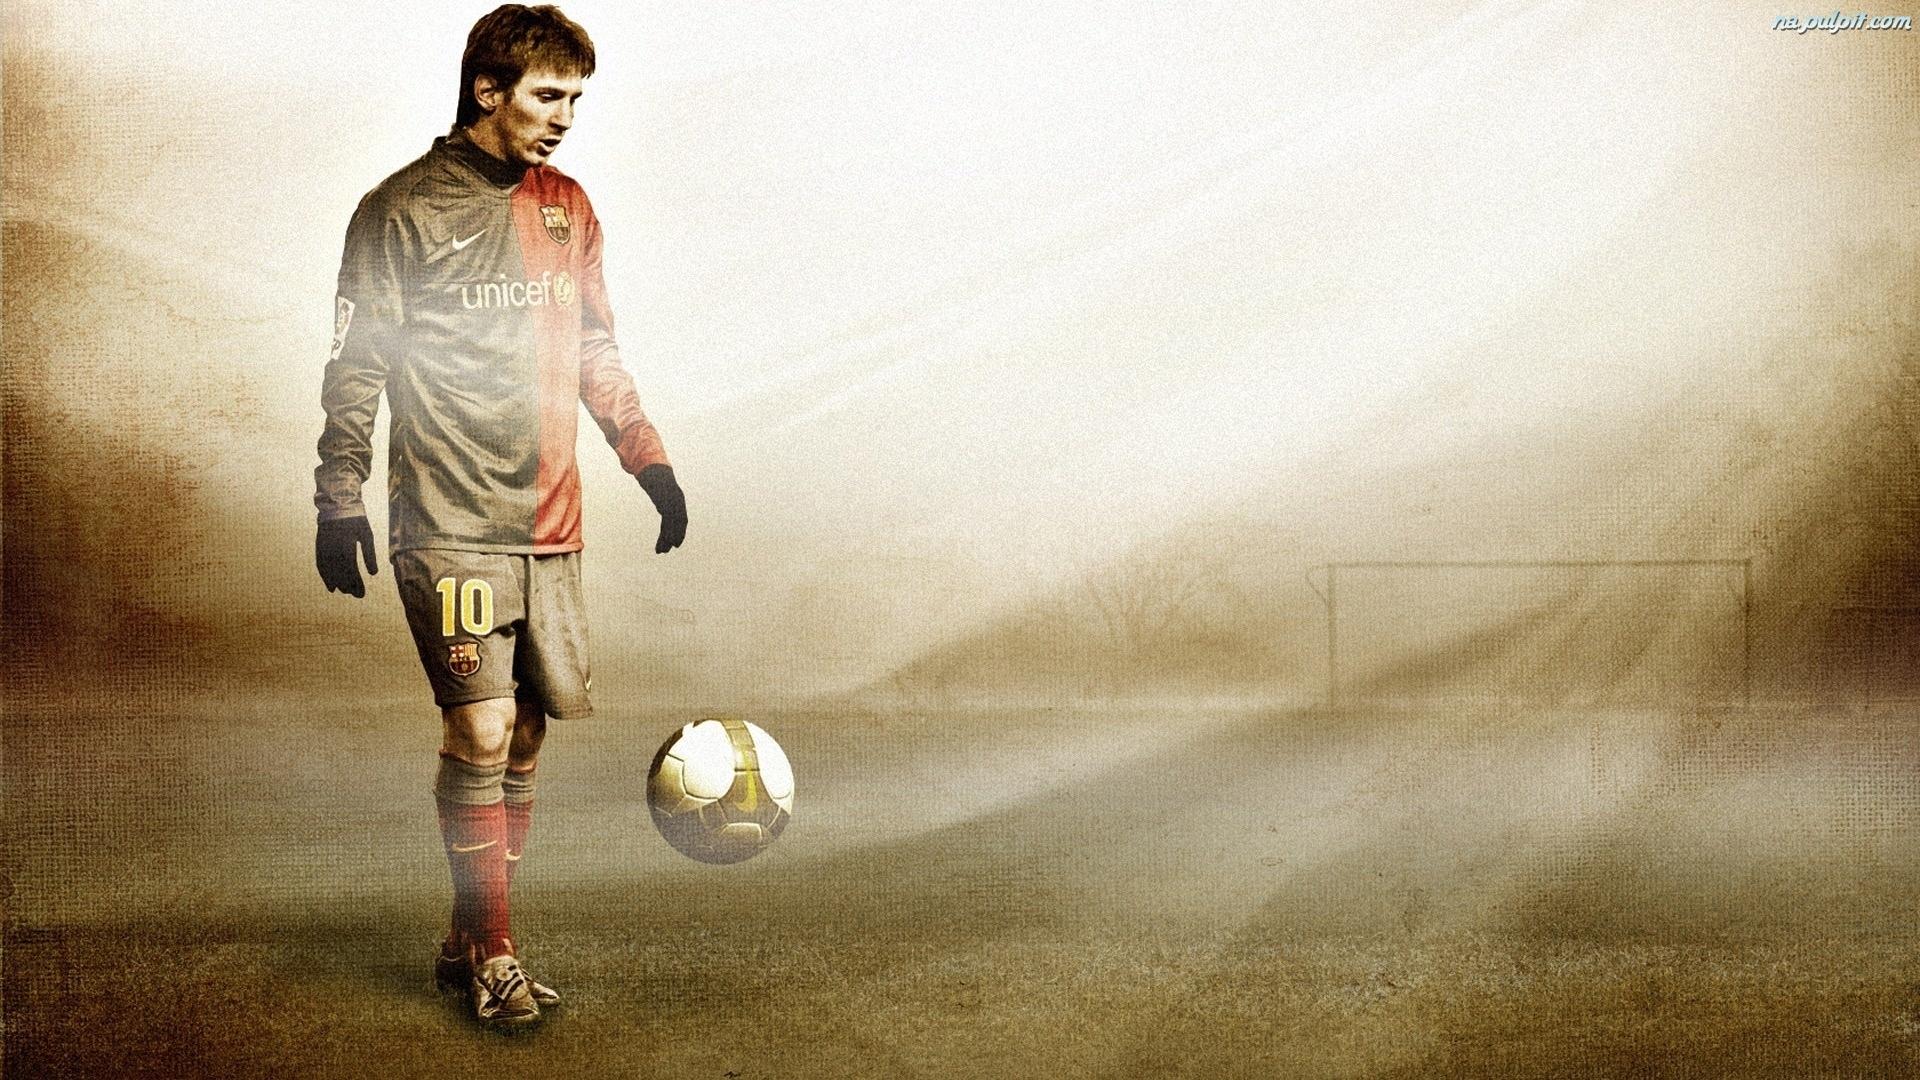 No  Na  Lionel Messi  Pi  Ka